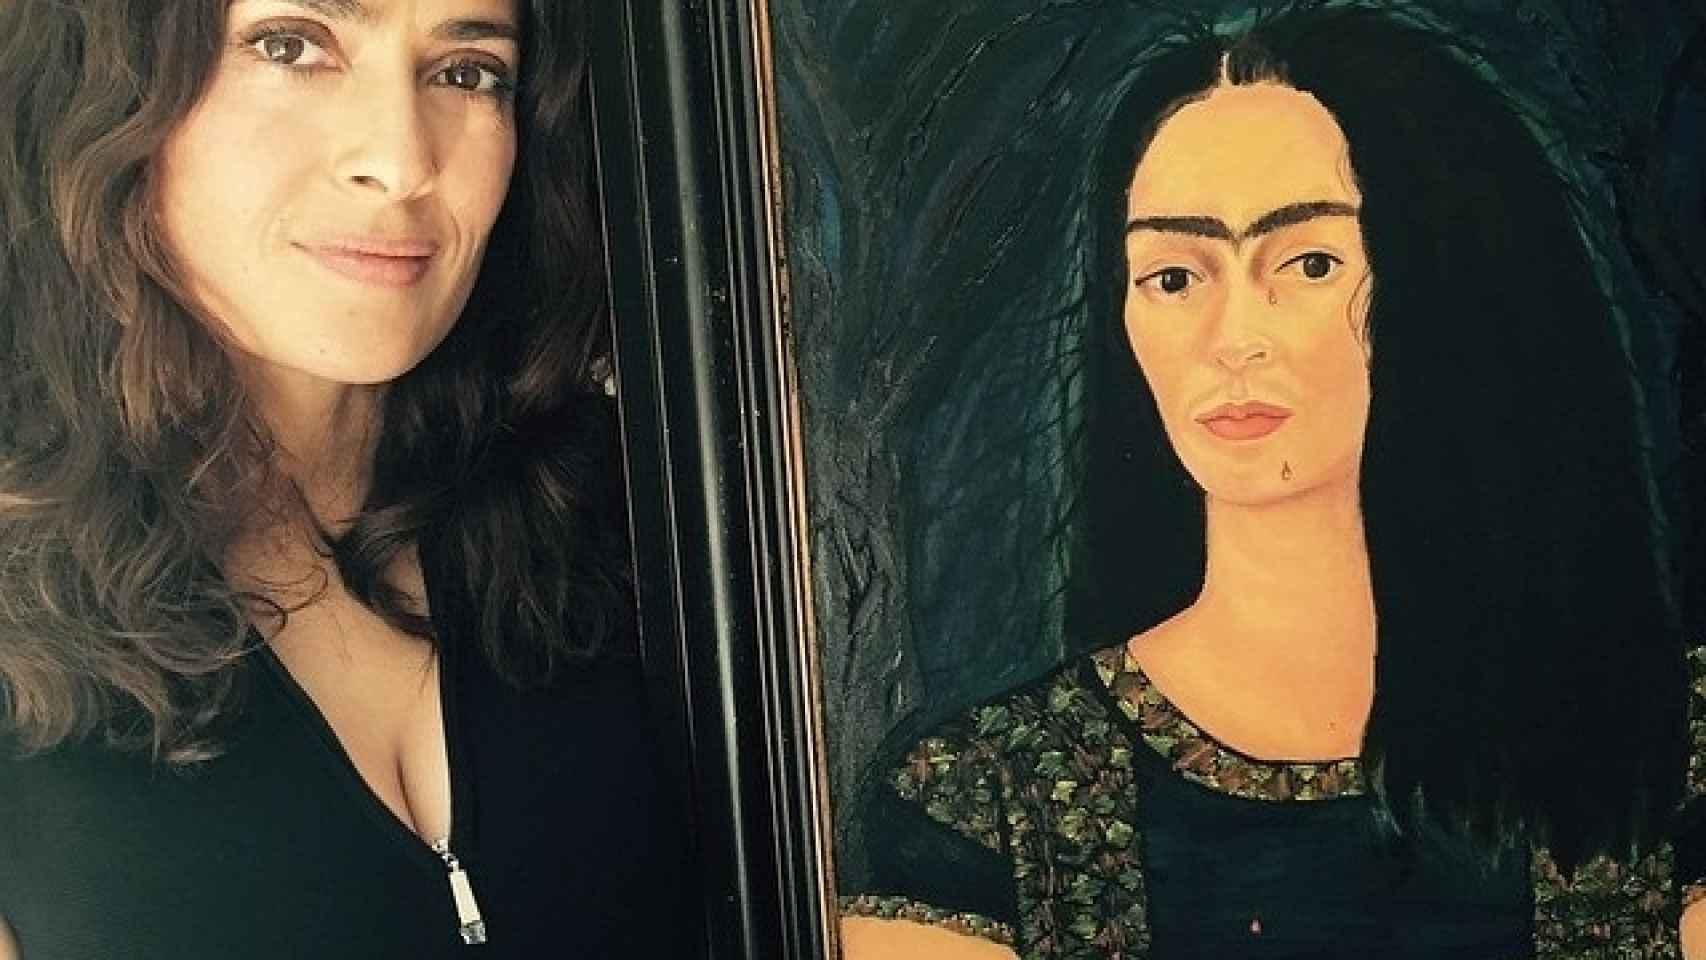 Salma Hayek posa con un cuadro, pintado por ella misma, caracterizada de Frida Kahlo